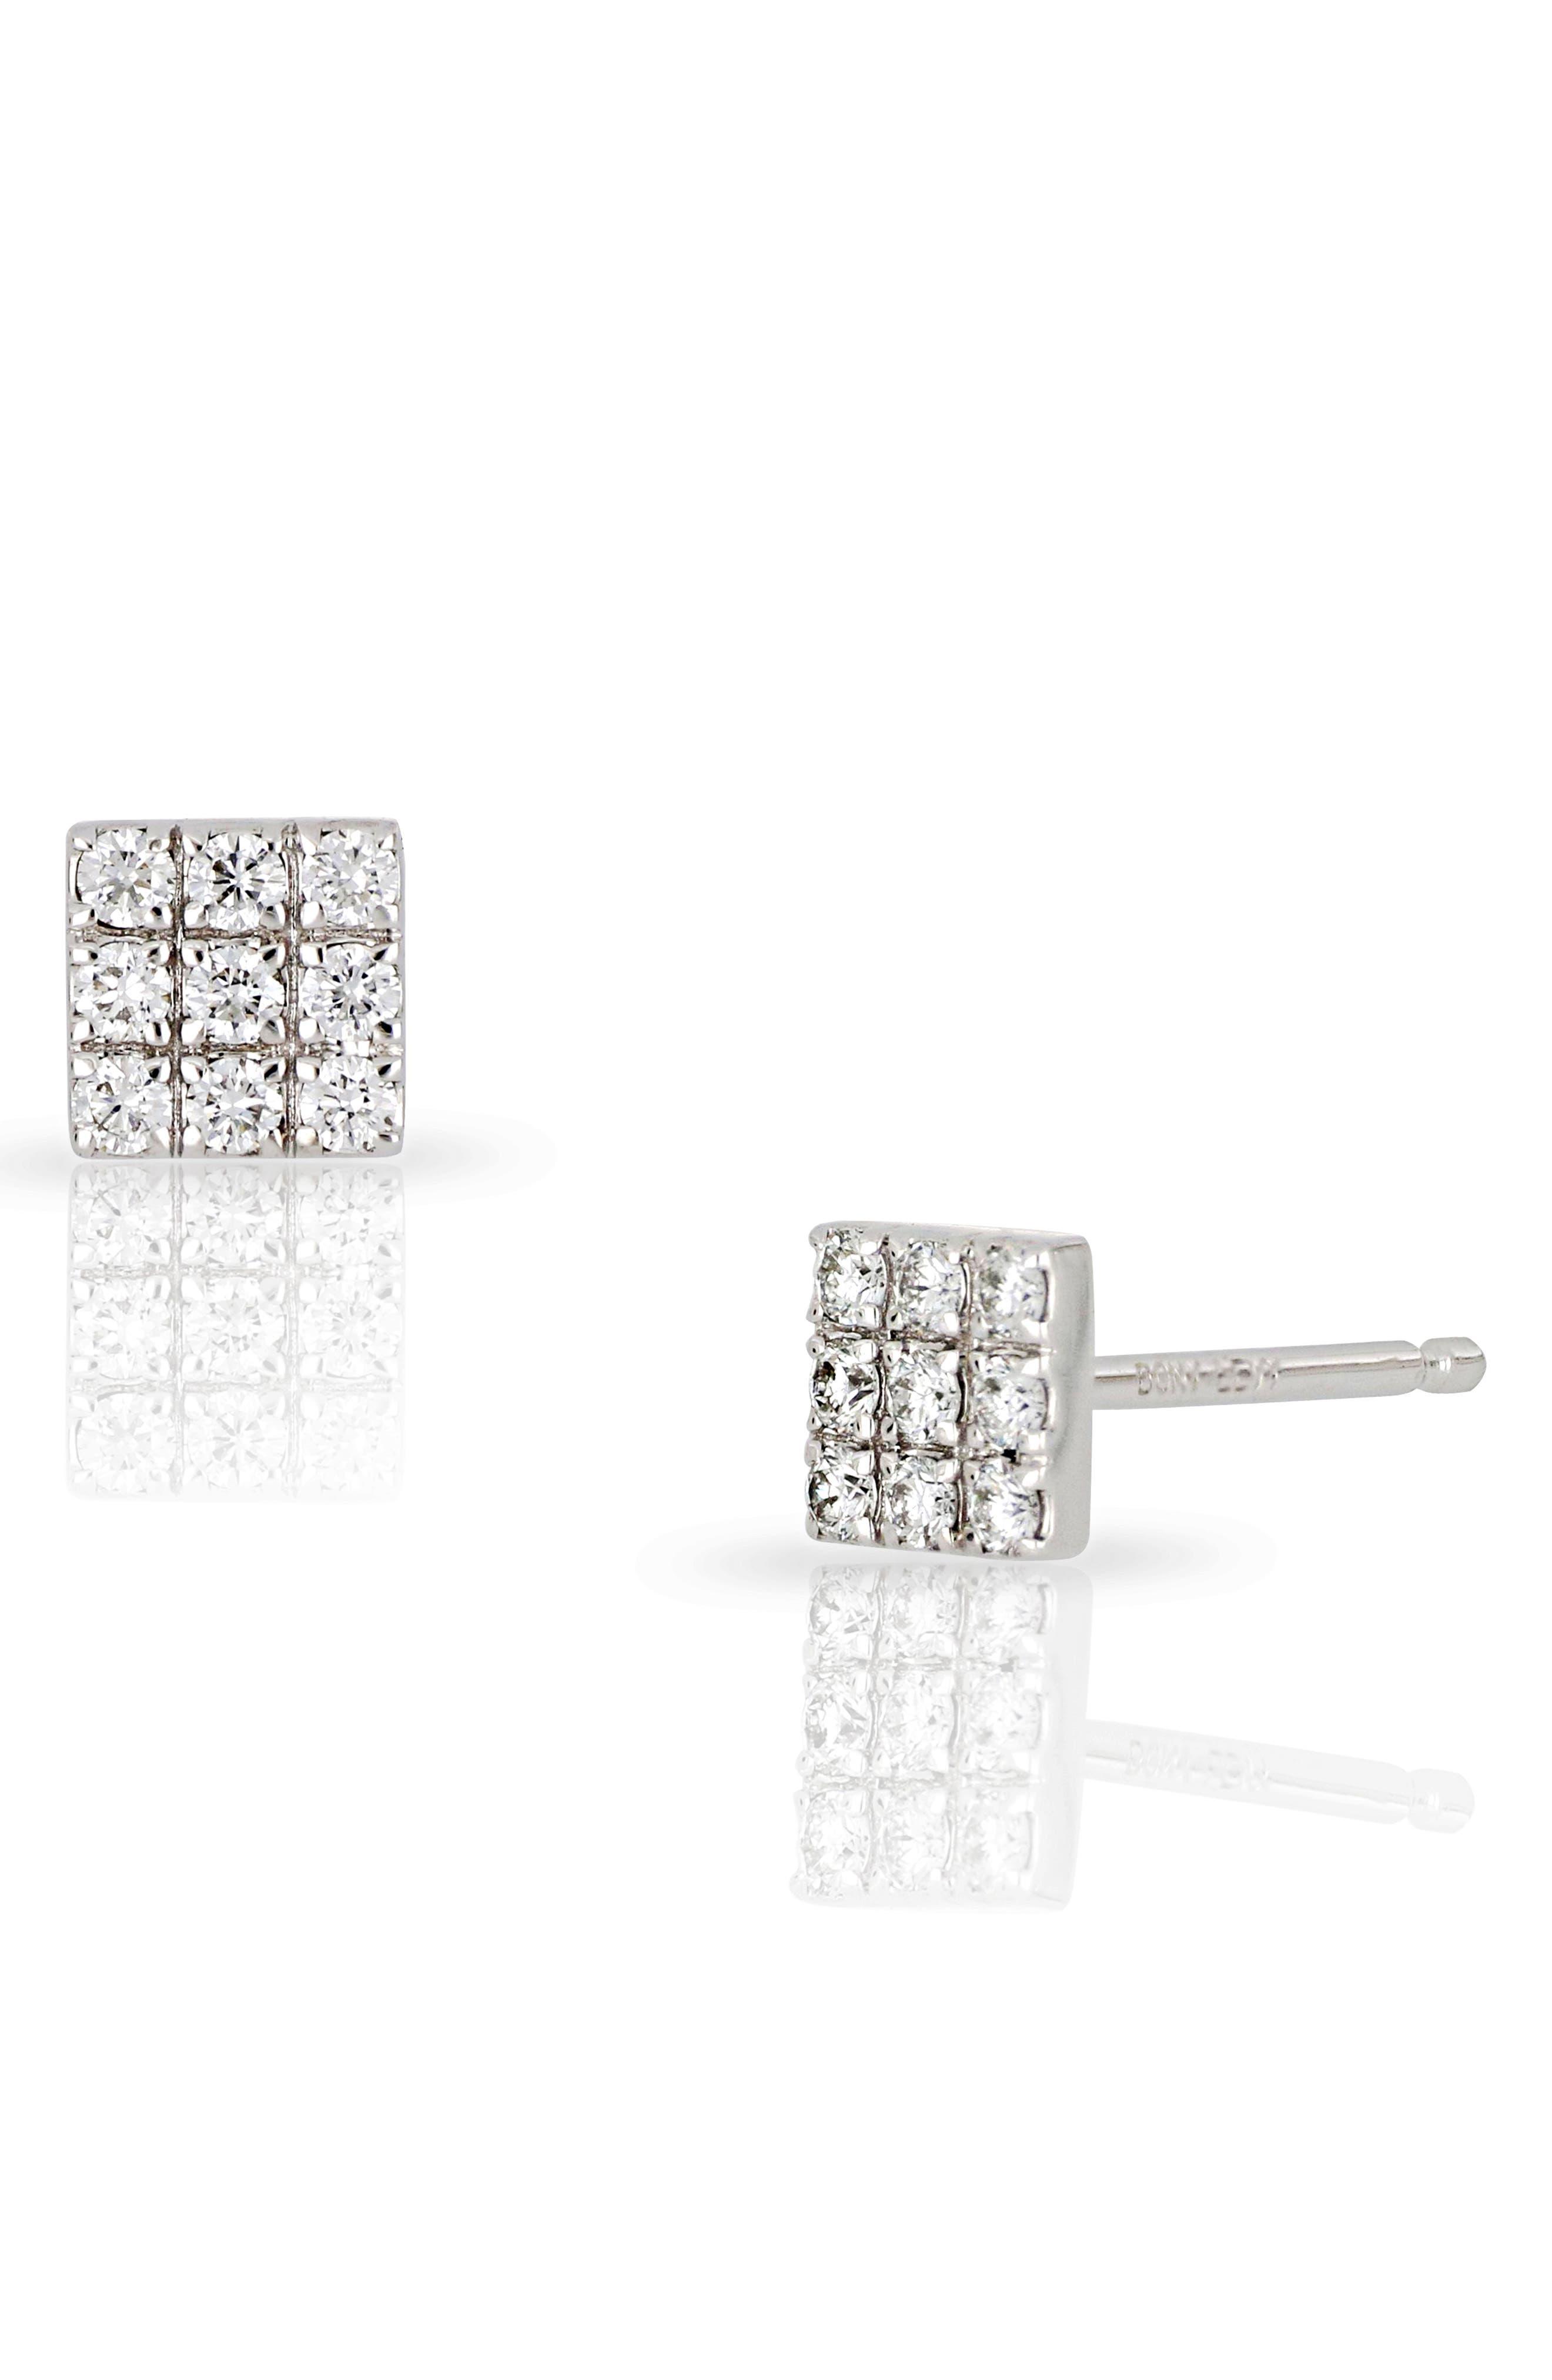 Kiera Square Diamond Stud Earrings,                         Main,                         color, WHITE GOLD